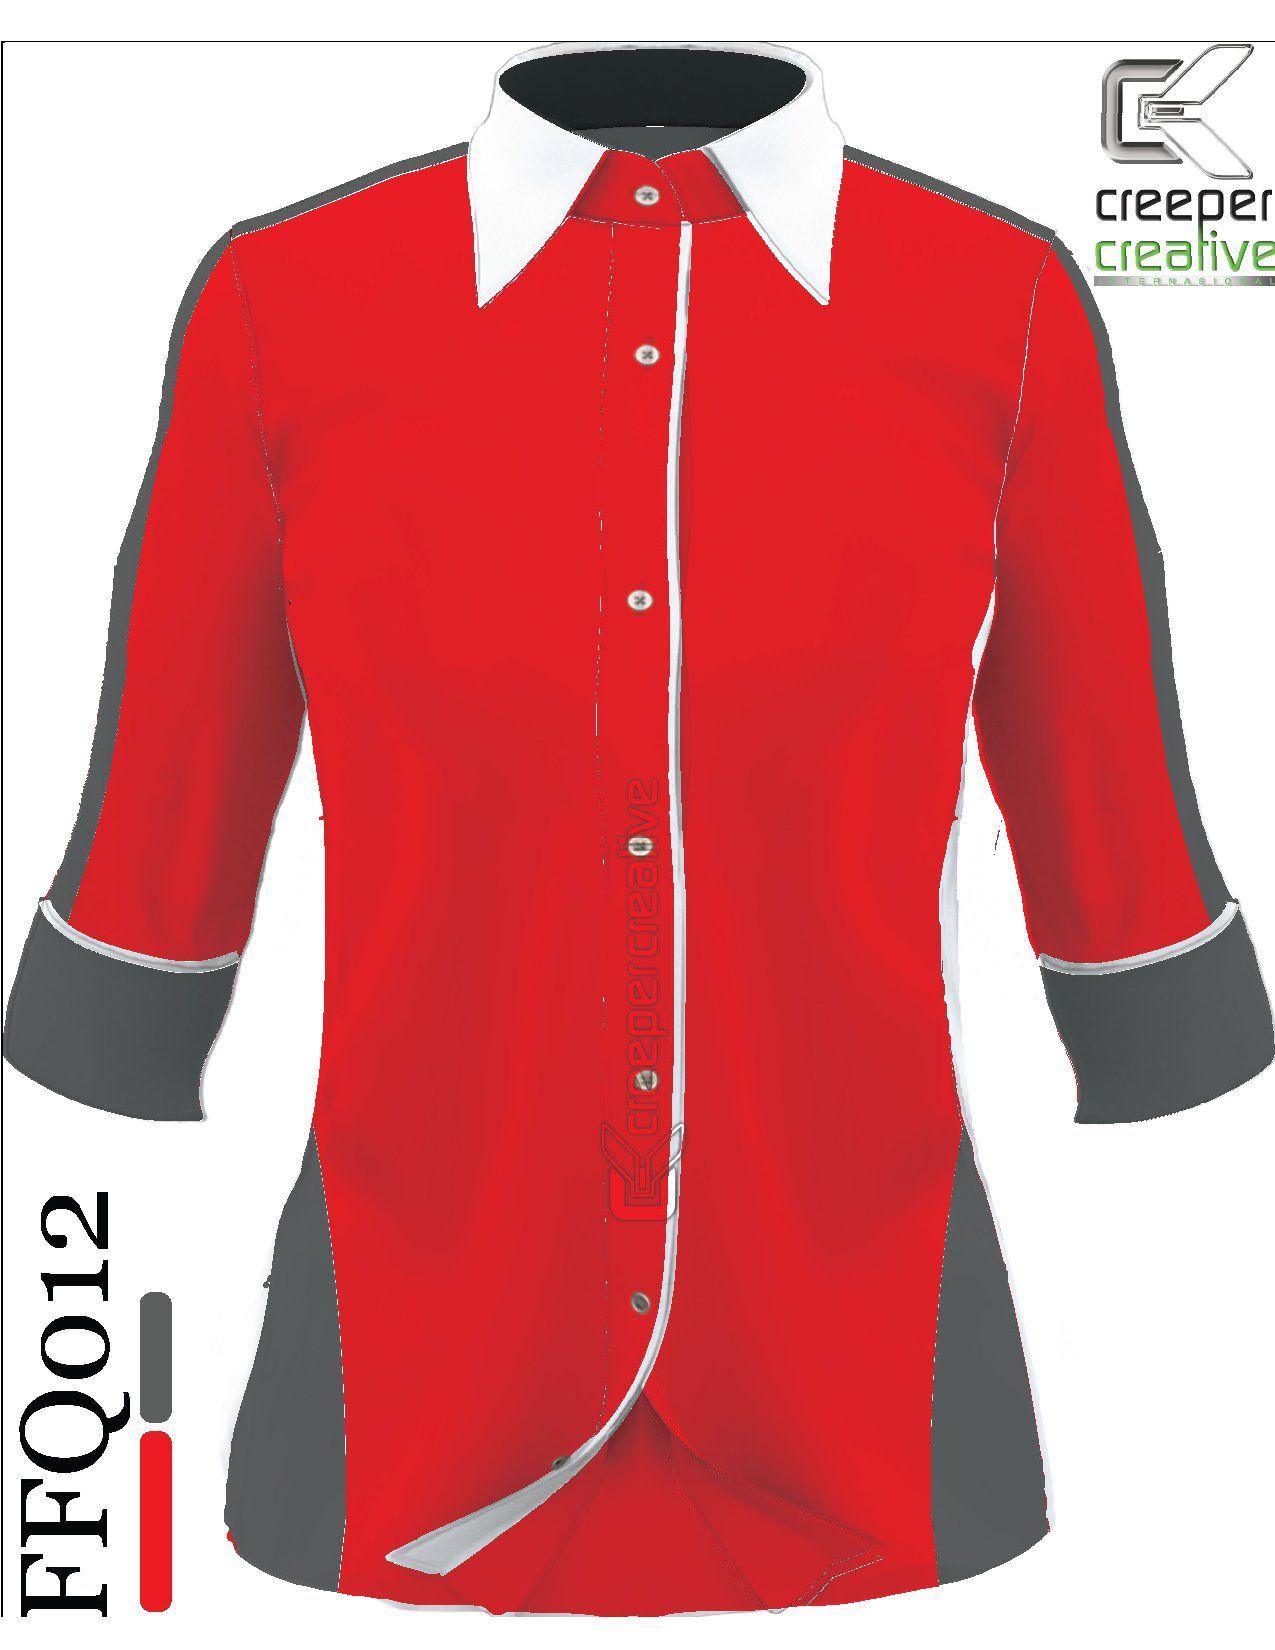 Anda Nak Tempah Baju Korporat Design Menarik & Berkualiti 03 6148 0154